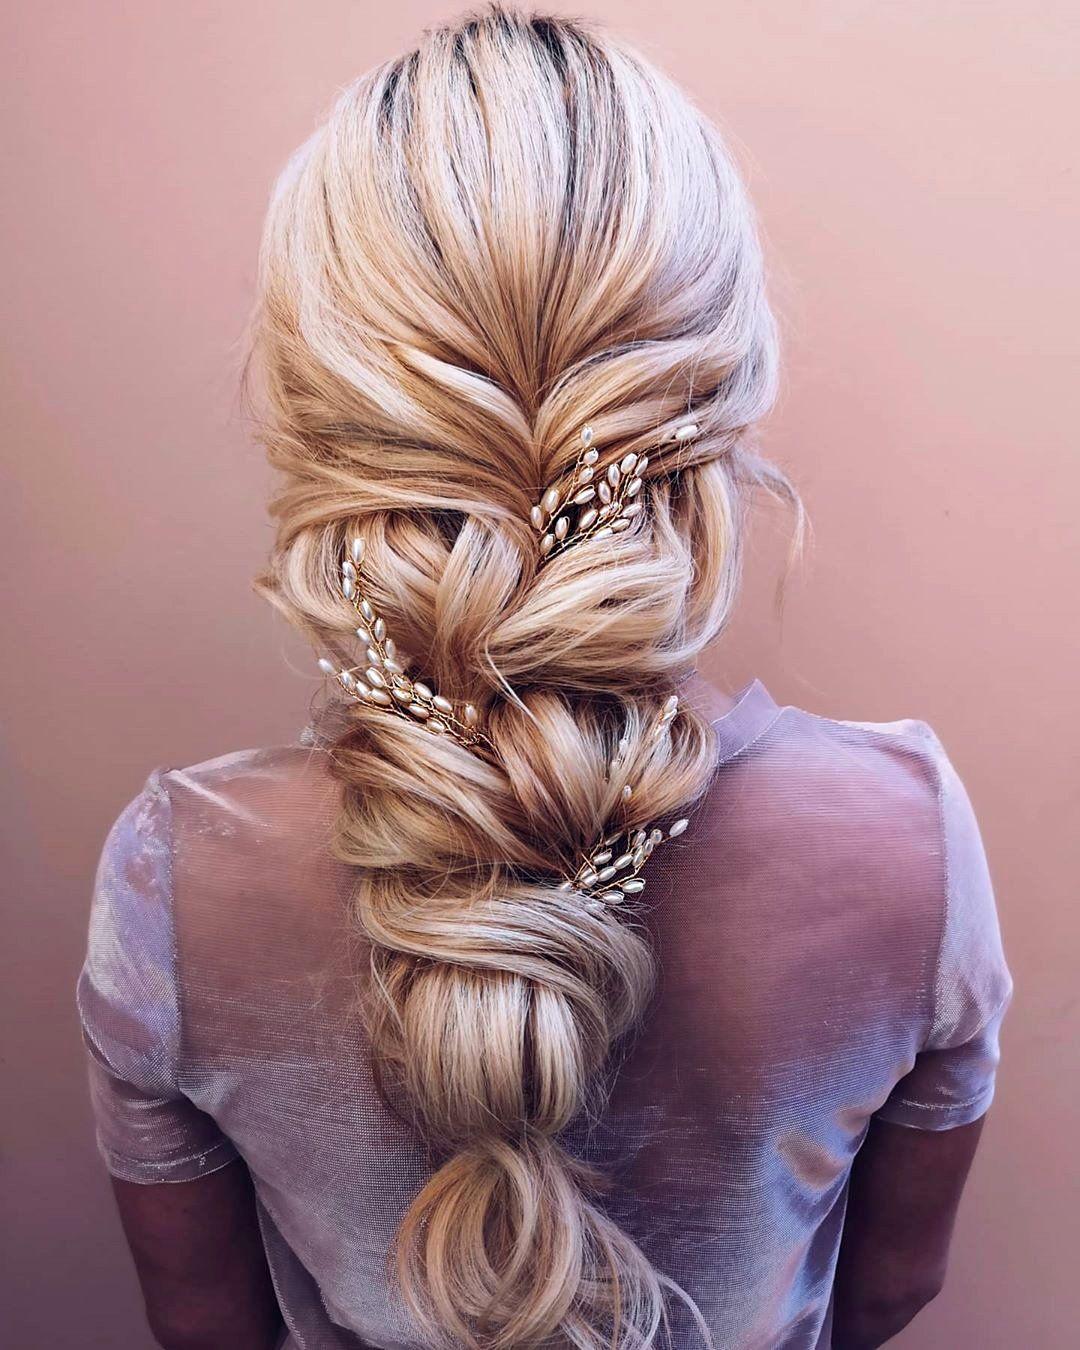 39 Adorable Braided Wedding Hair Ideas In 2021 Wedding Hair Inspiration Long Hair Designs Bride Hairstyles